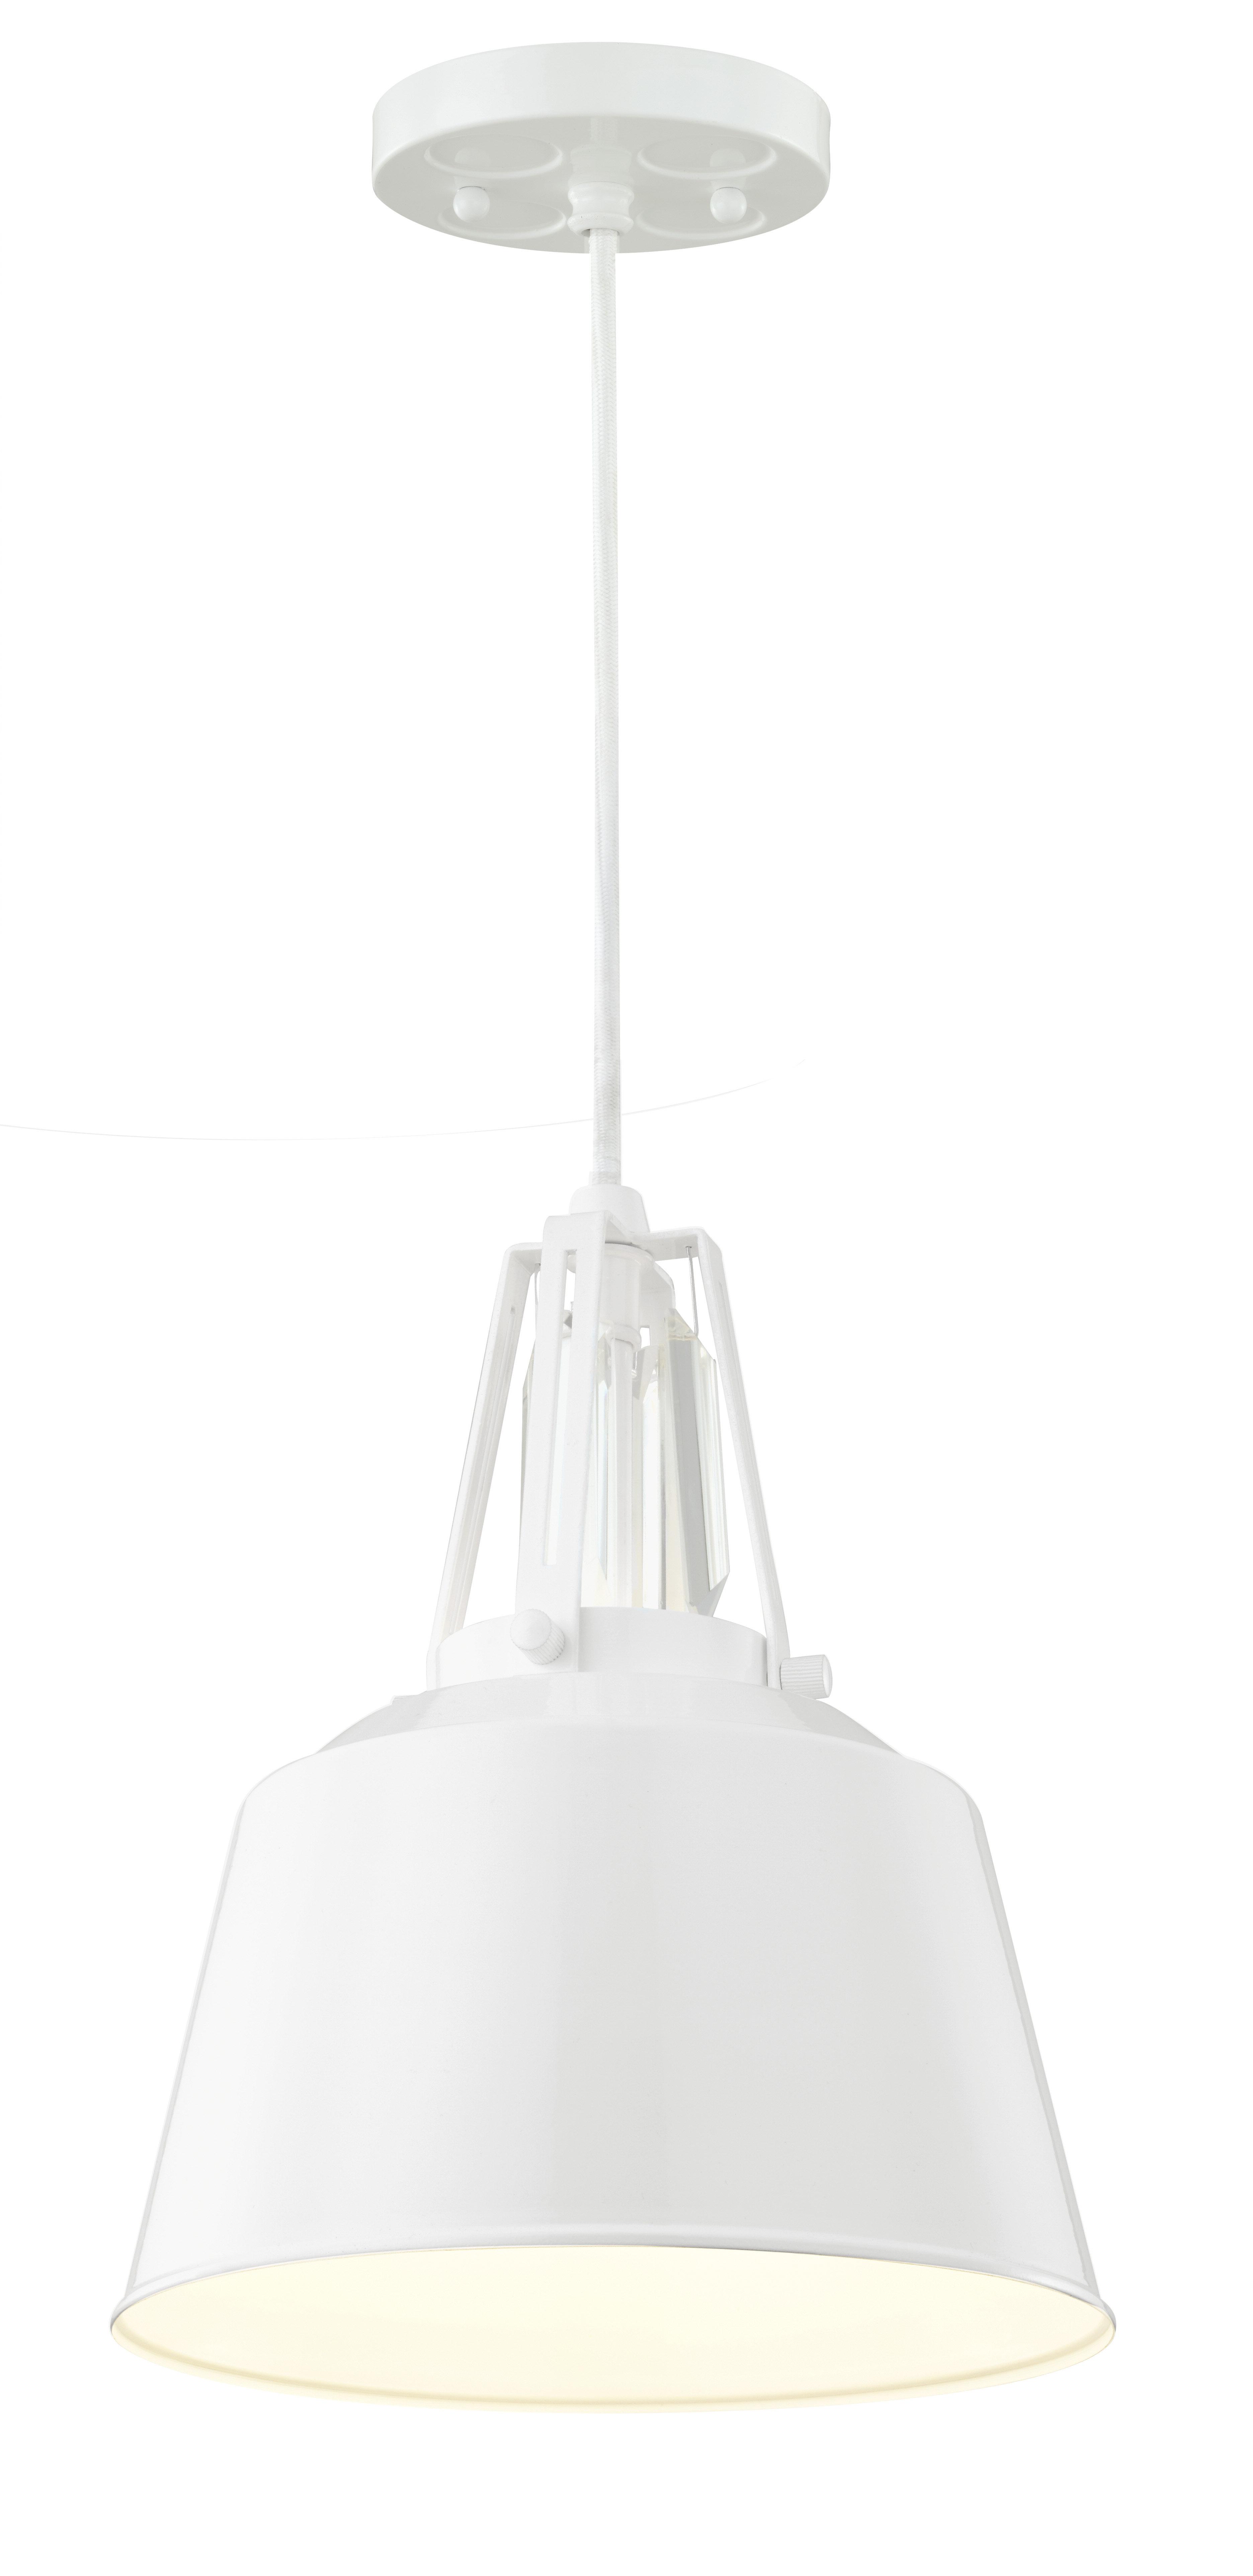 Sarah 1 Light Single Bell Pendant Regarding Most Current Nadeau 1 Light Single Cone Pendants (View 23 of 25)